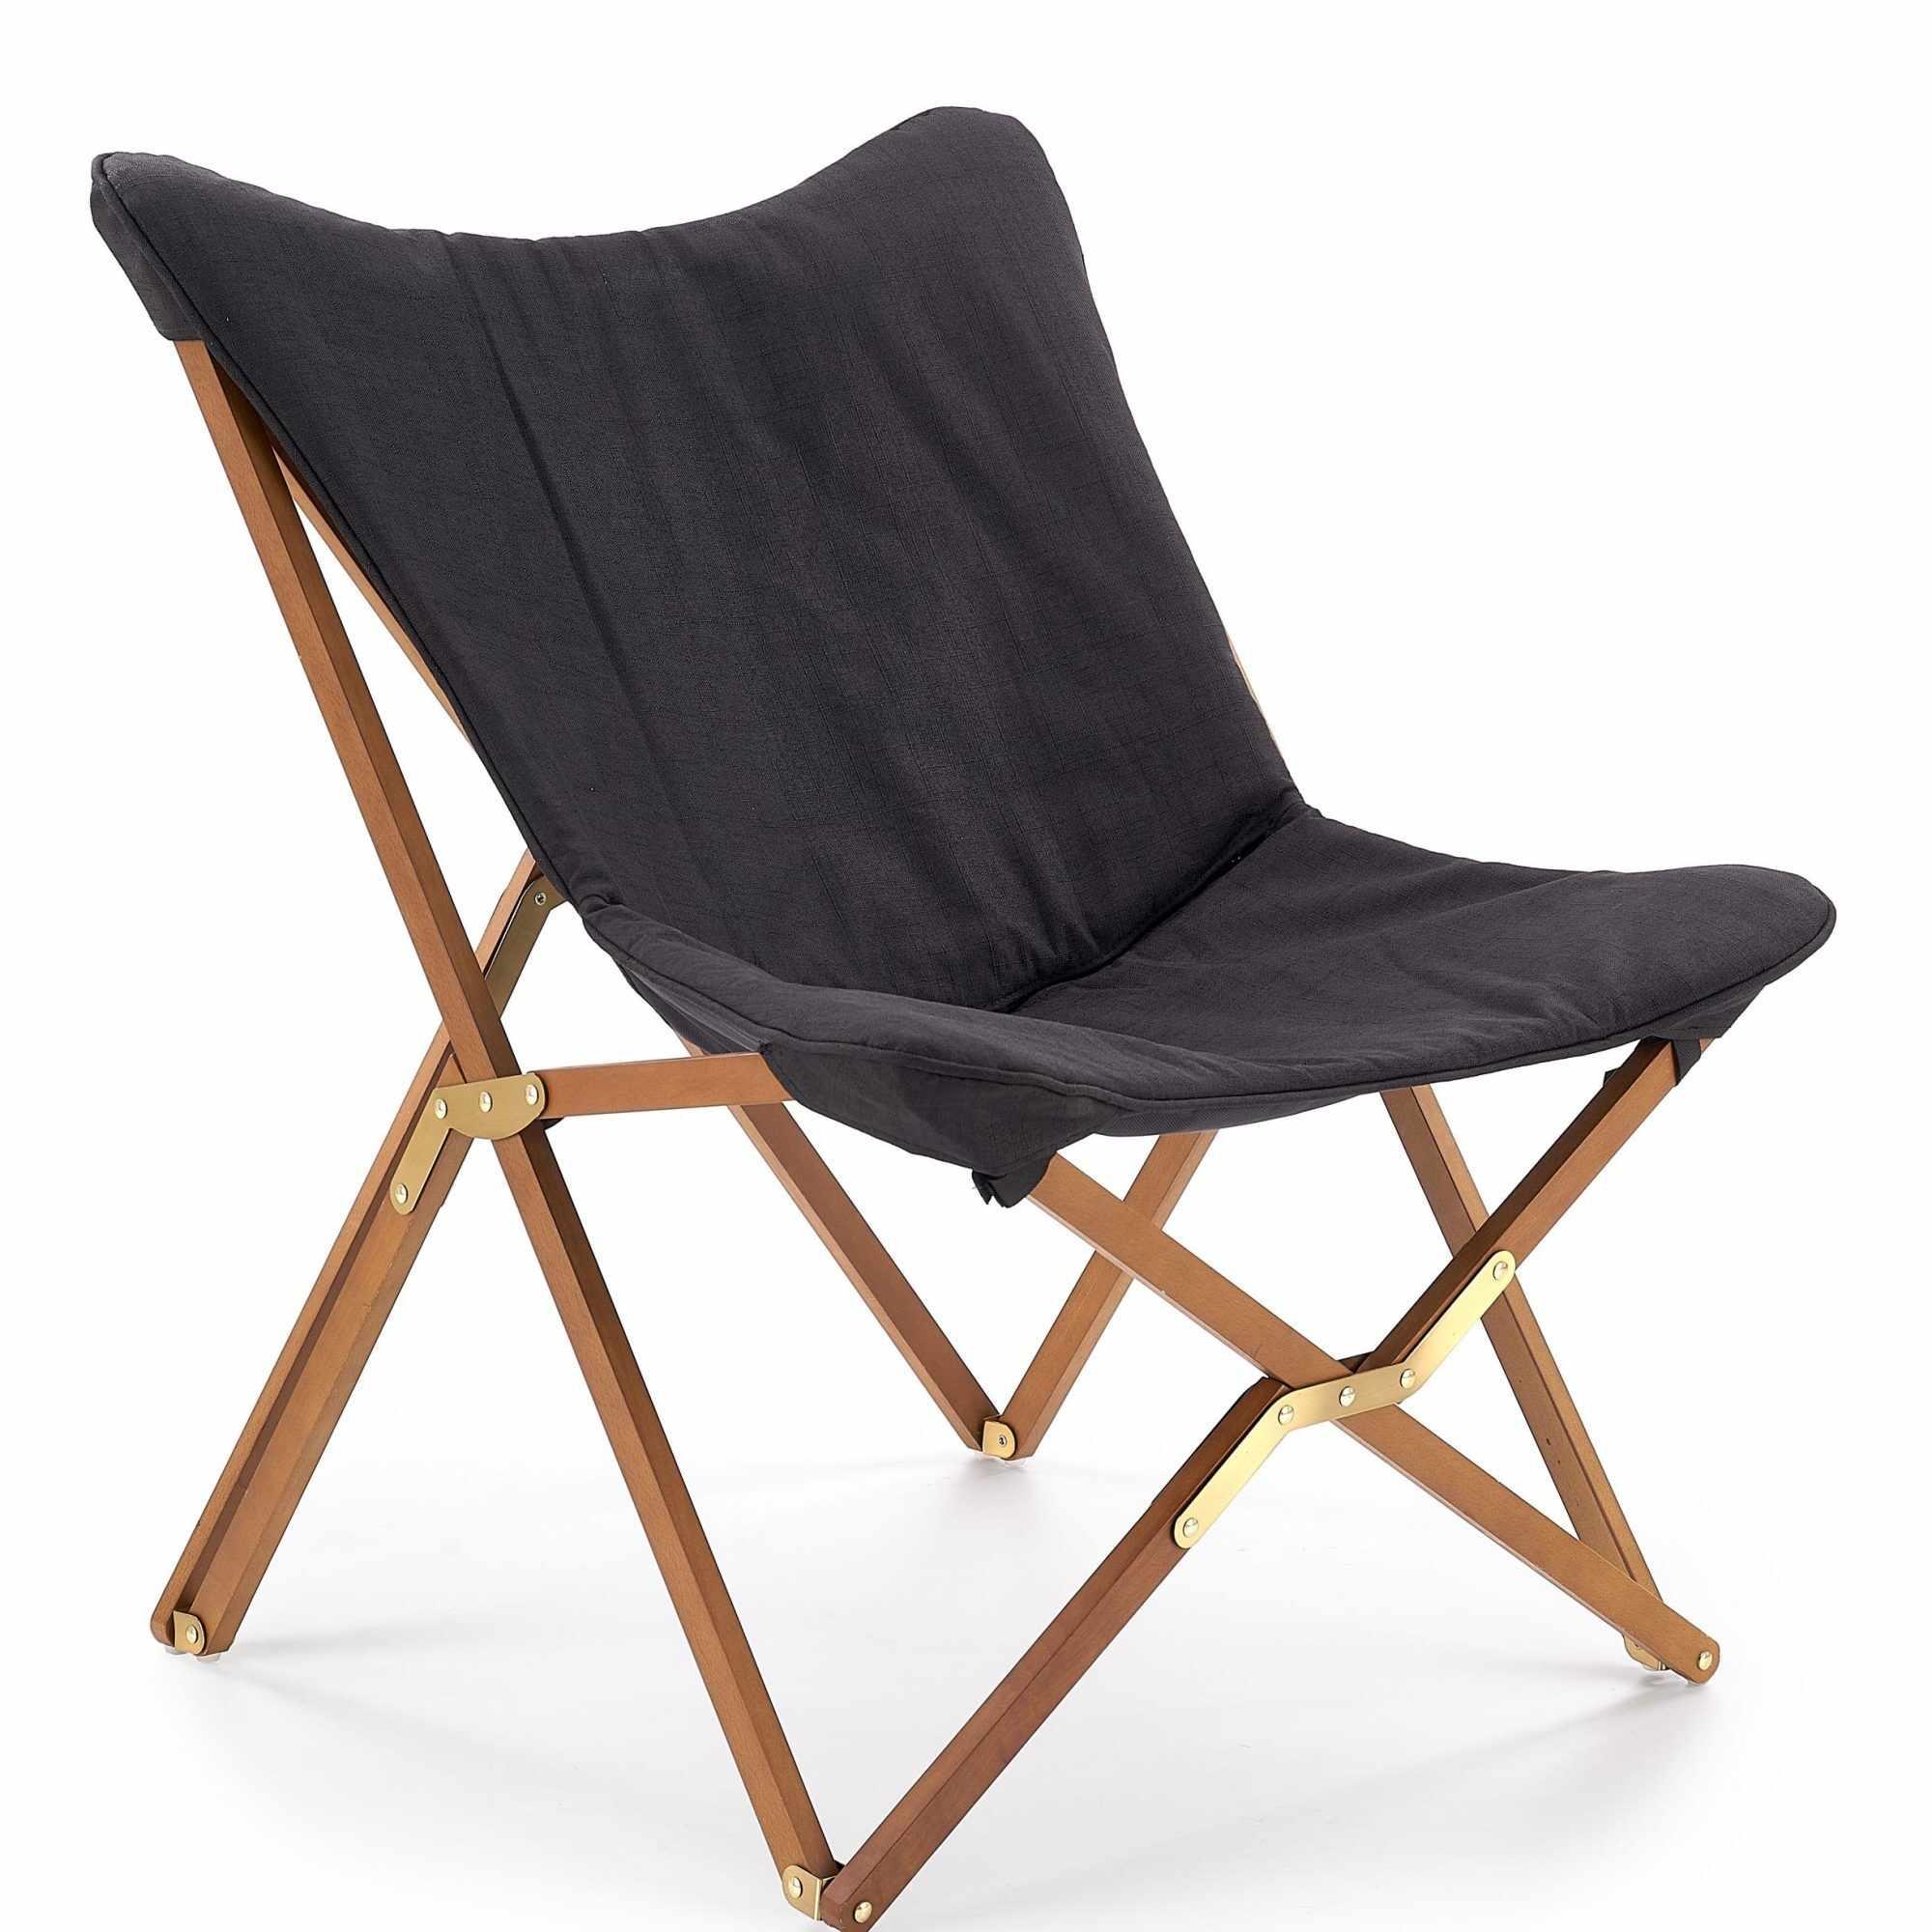 Scaun pliabil din lemn si stofa Volant Dark Grey / Walnut, l76xA83xH97 cm la pret 383 lei